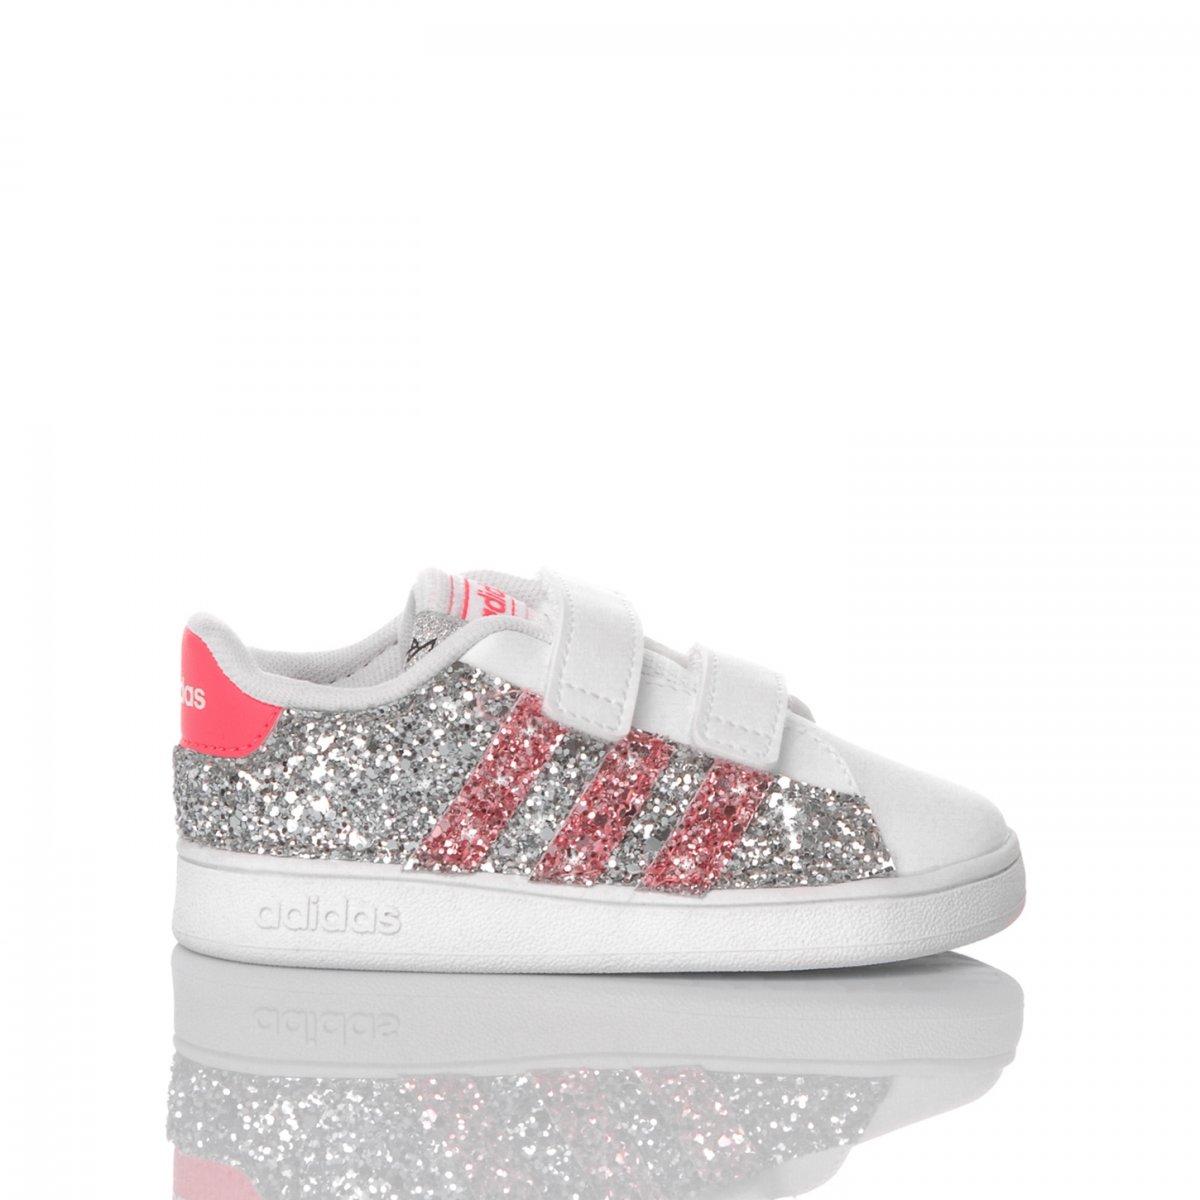 adidas bambina glitter,sirpizzaky.com